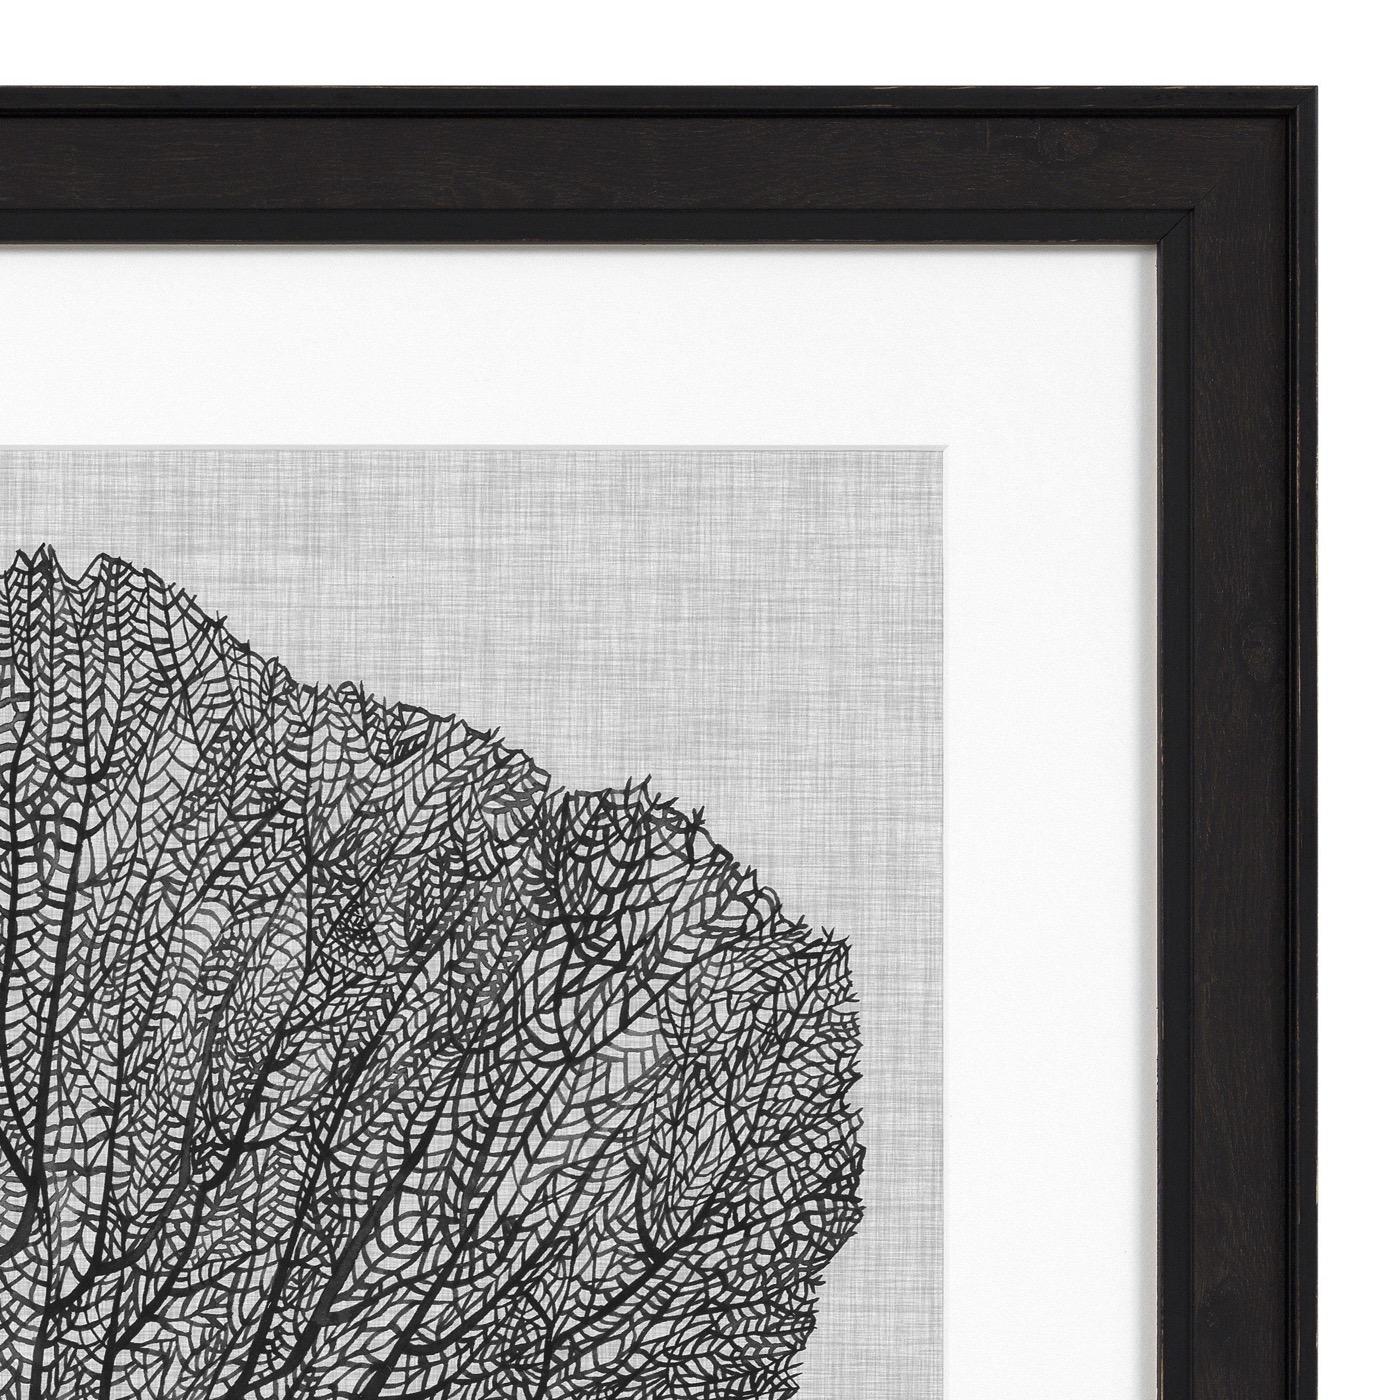 Cabo Sea Fan Prints | Set of 4